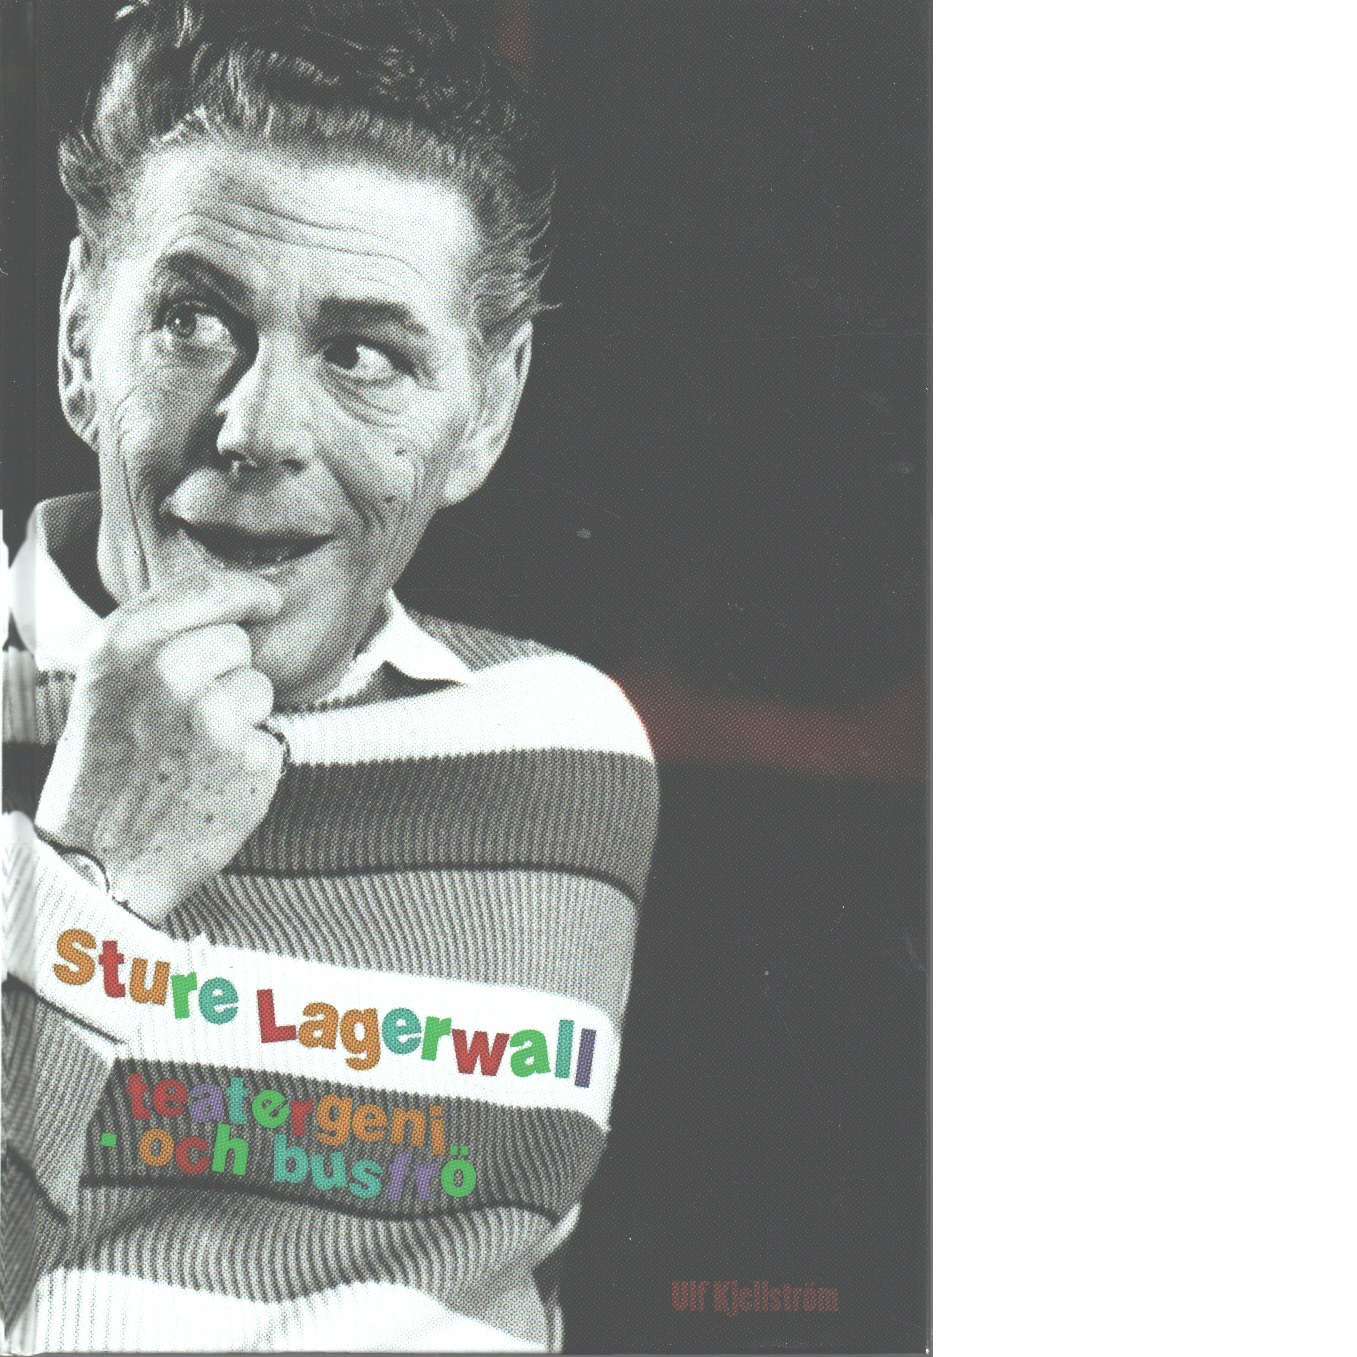 Sture Lagerwall : teatergeni - och busfrö - Kjellström, Ulf